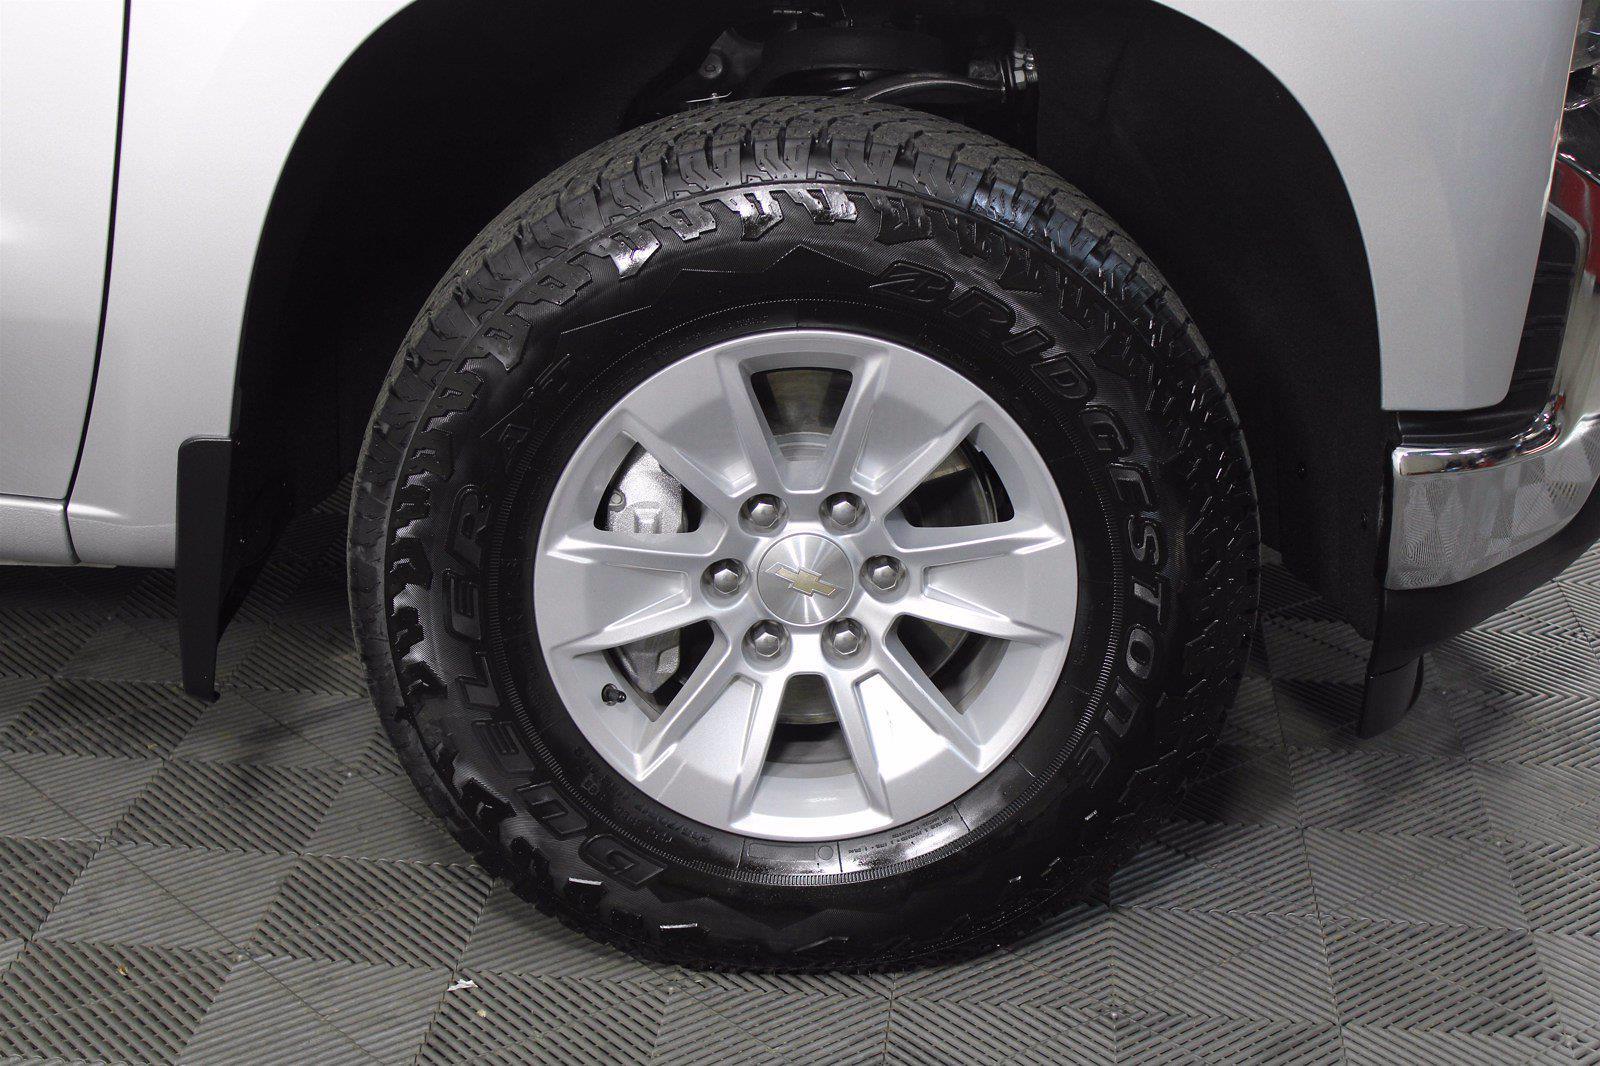 2020 Chevrolet Silverado 1500 Crew Cab 4x4, Pickup #D110855A - photo 5